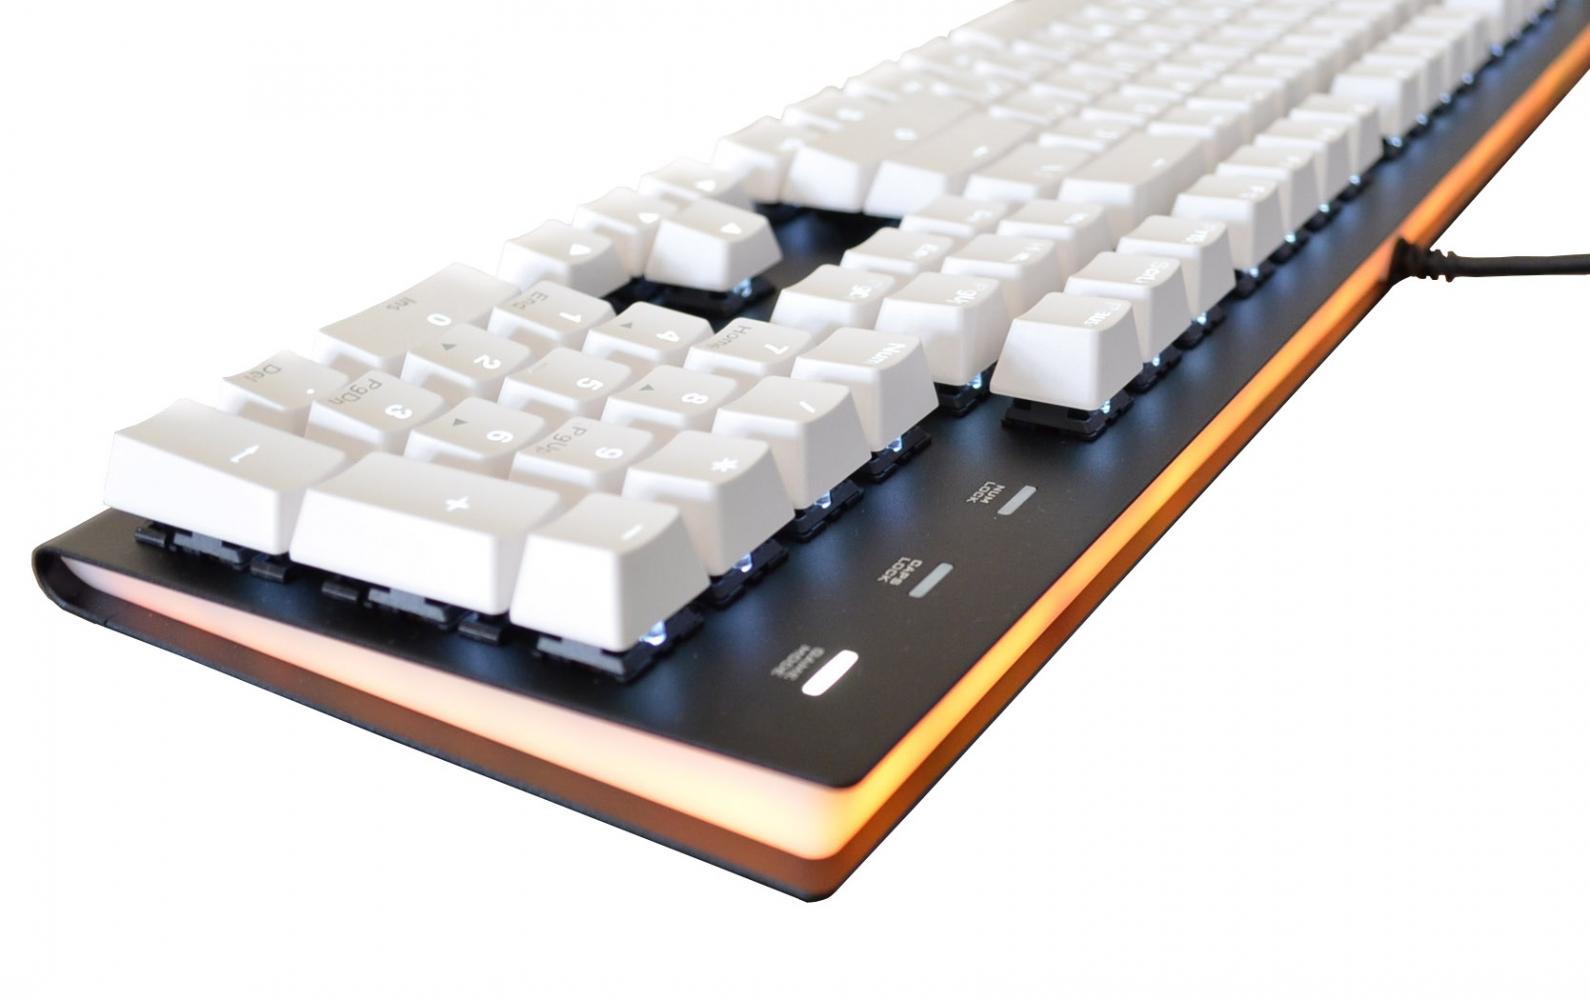 570a8515338 MK Fission White Keycaps White LED Double Shot PBT Mechanical ...